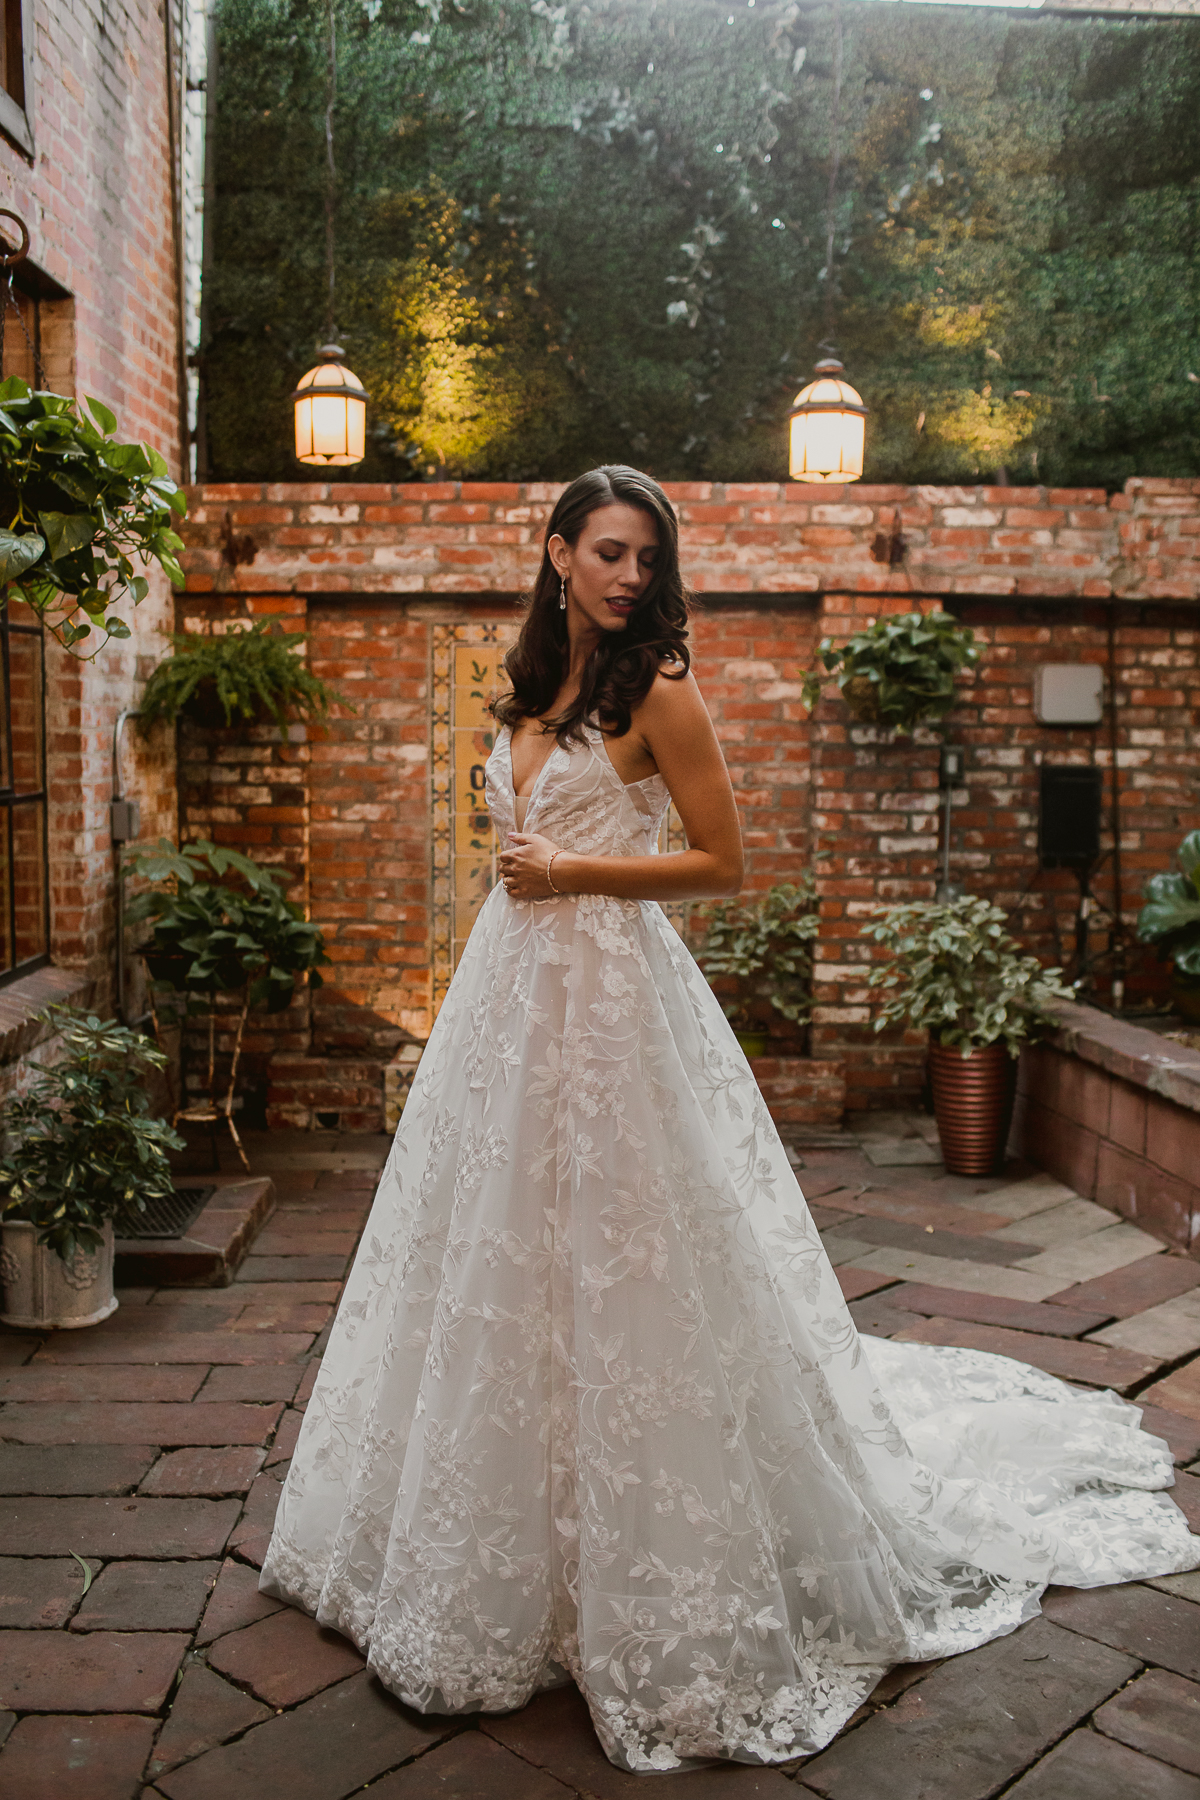 carondelet-house-kelley-raye-los-angeles-wedding-photographer-40.jpg